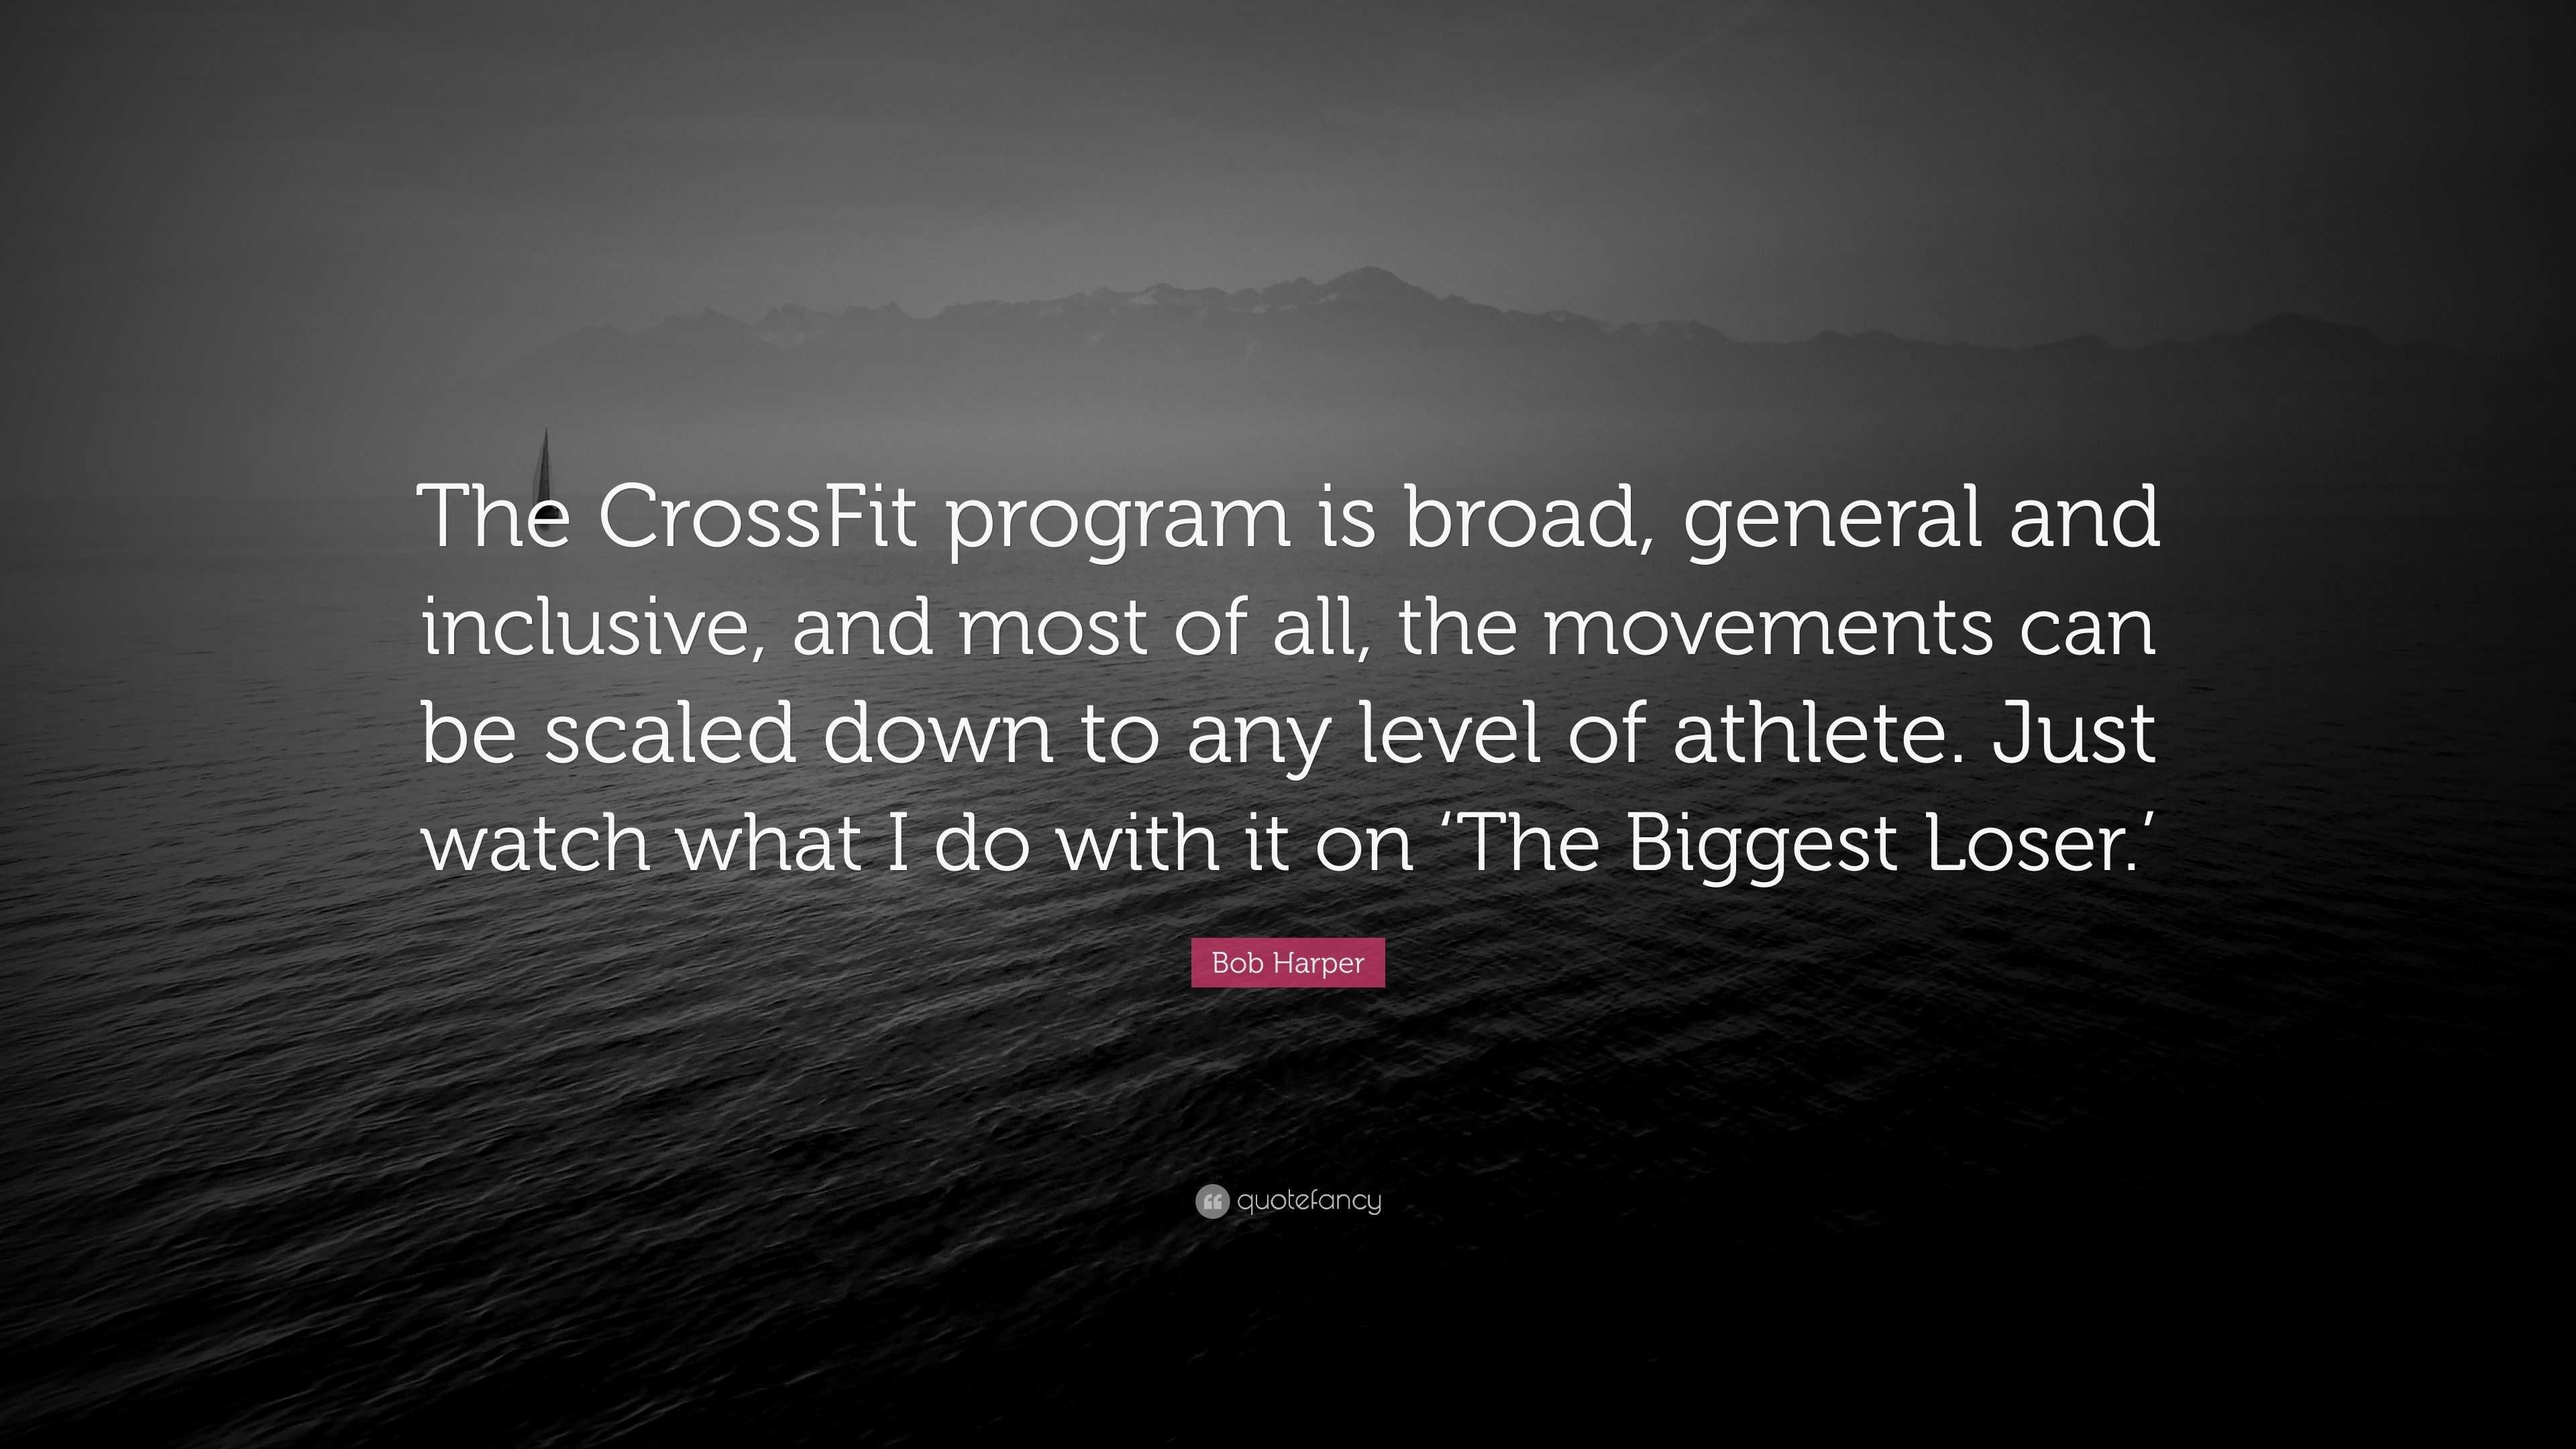 Bob Harper Quote The CrossFit Program Is Broad General And Inclusive